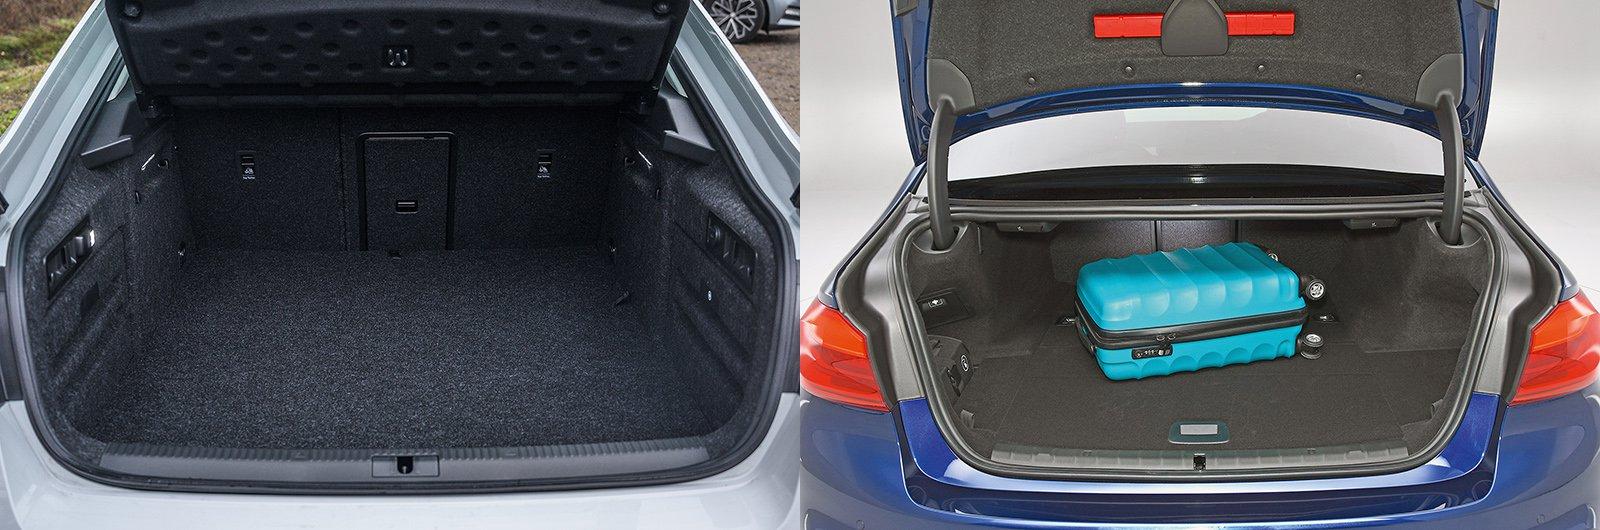 New Skoda Superb iV vs used BMW 530e: boot